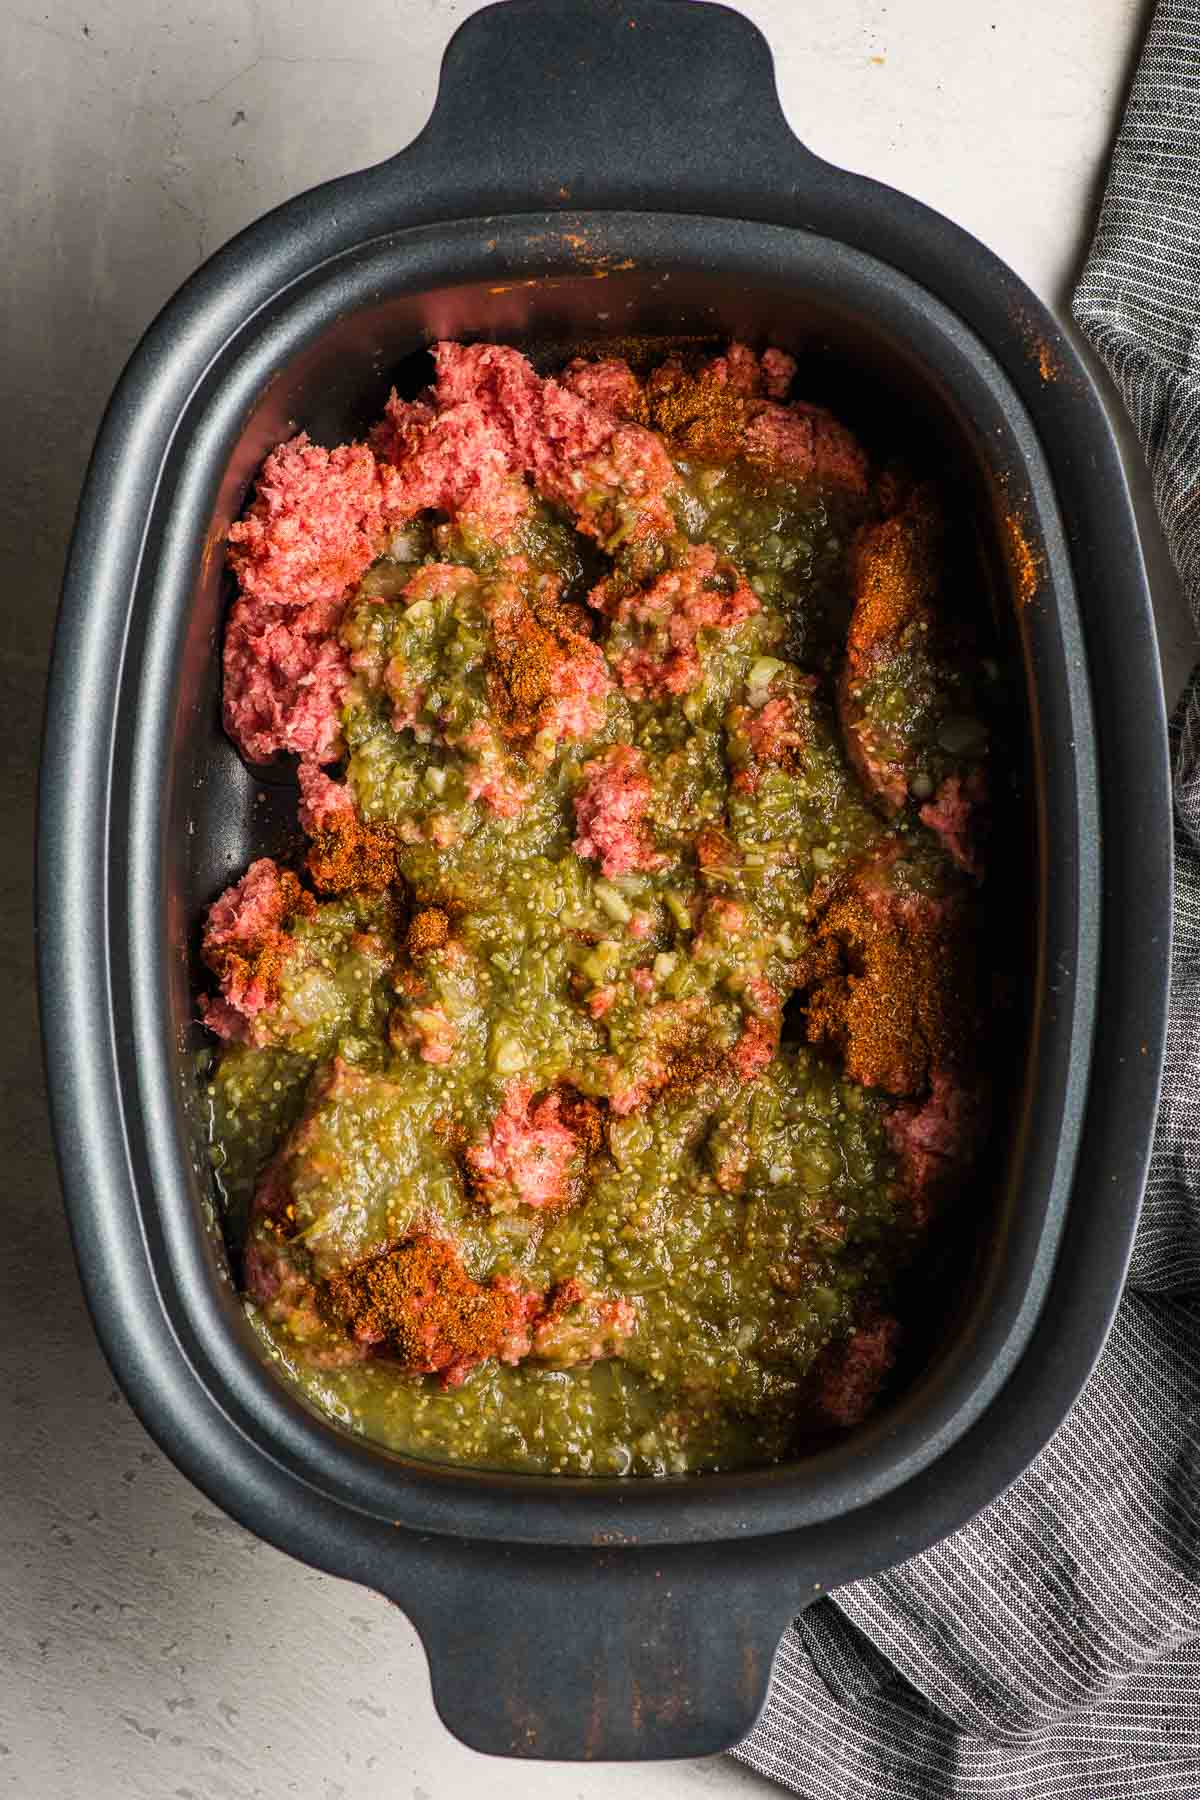 Slow Cooker Taco Meat ingredients in the crock pot.